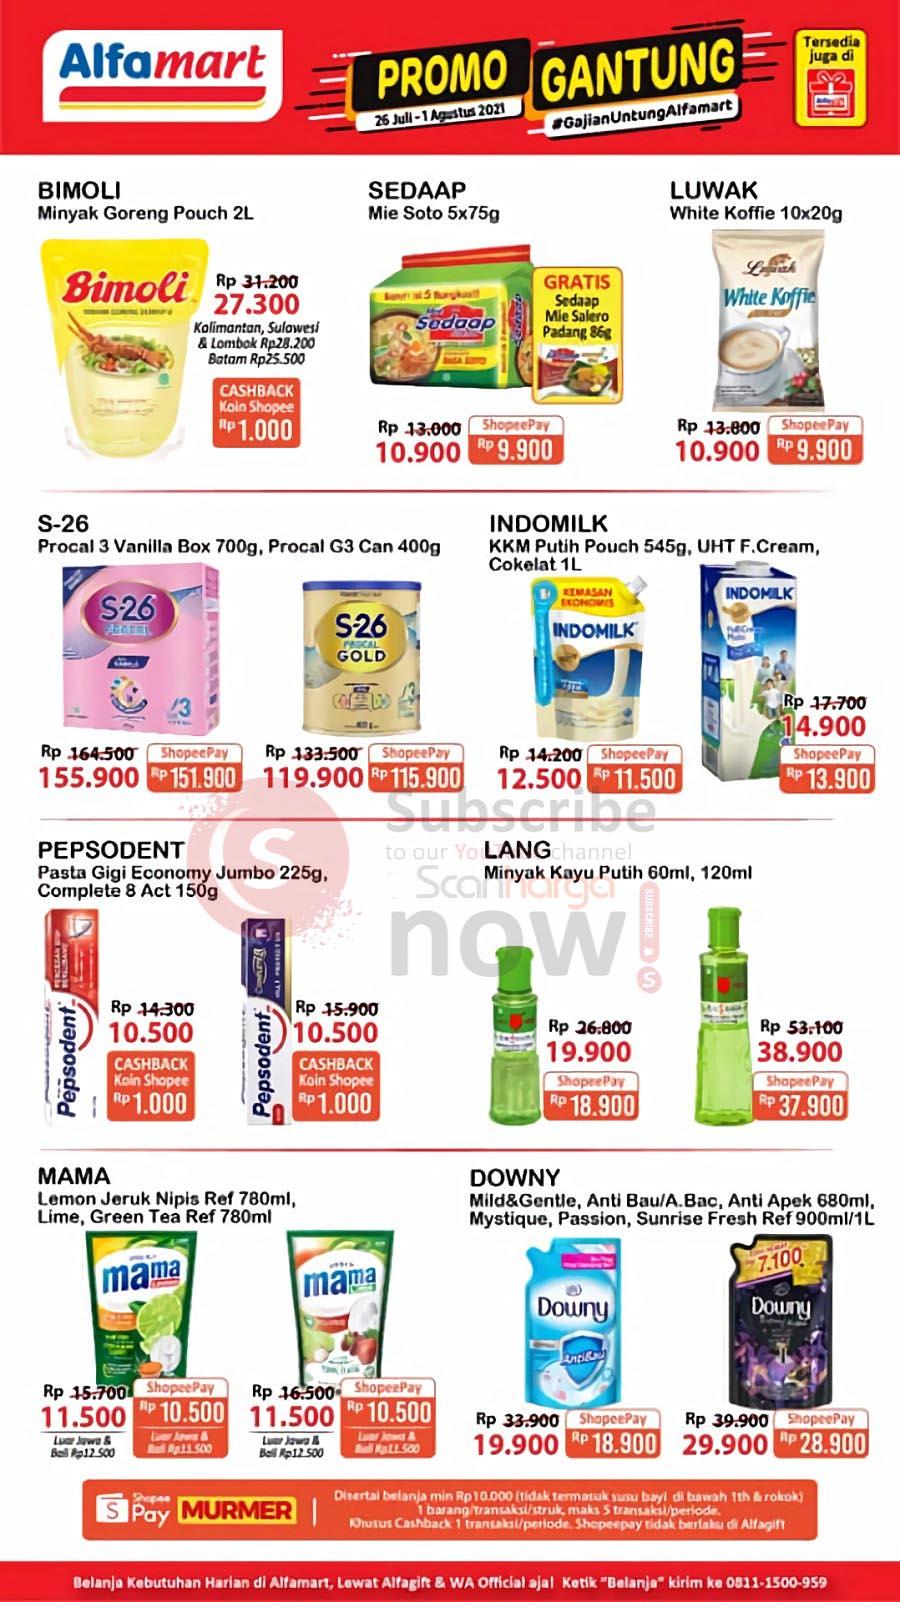 Promo Alfamart Gajian Untung (Gantung) Periode 26 Juli - 1 Agustus 2021